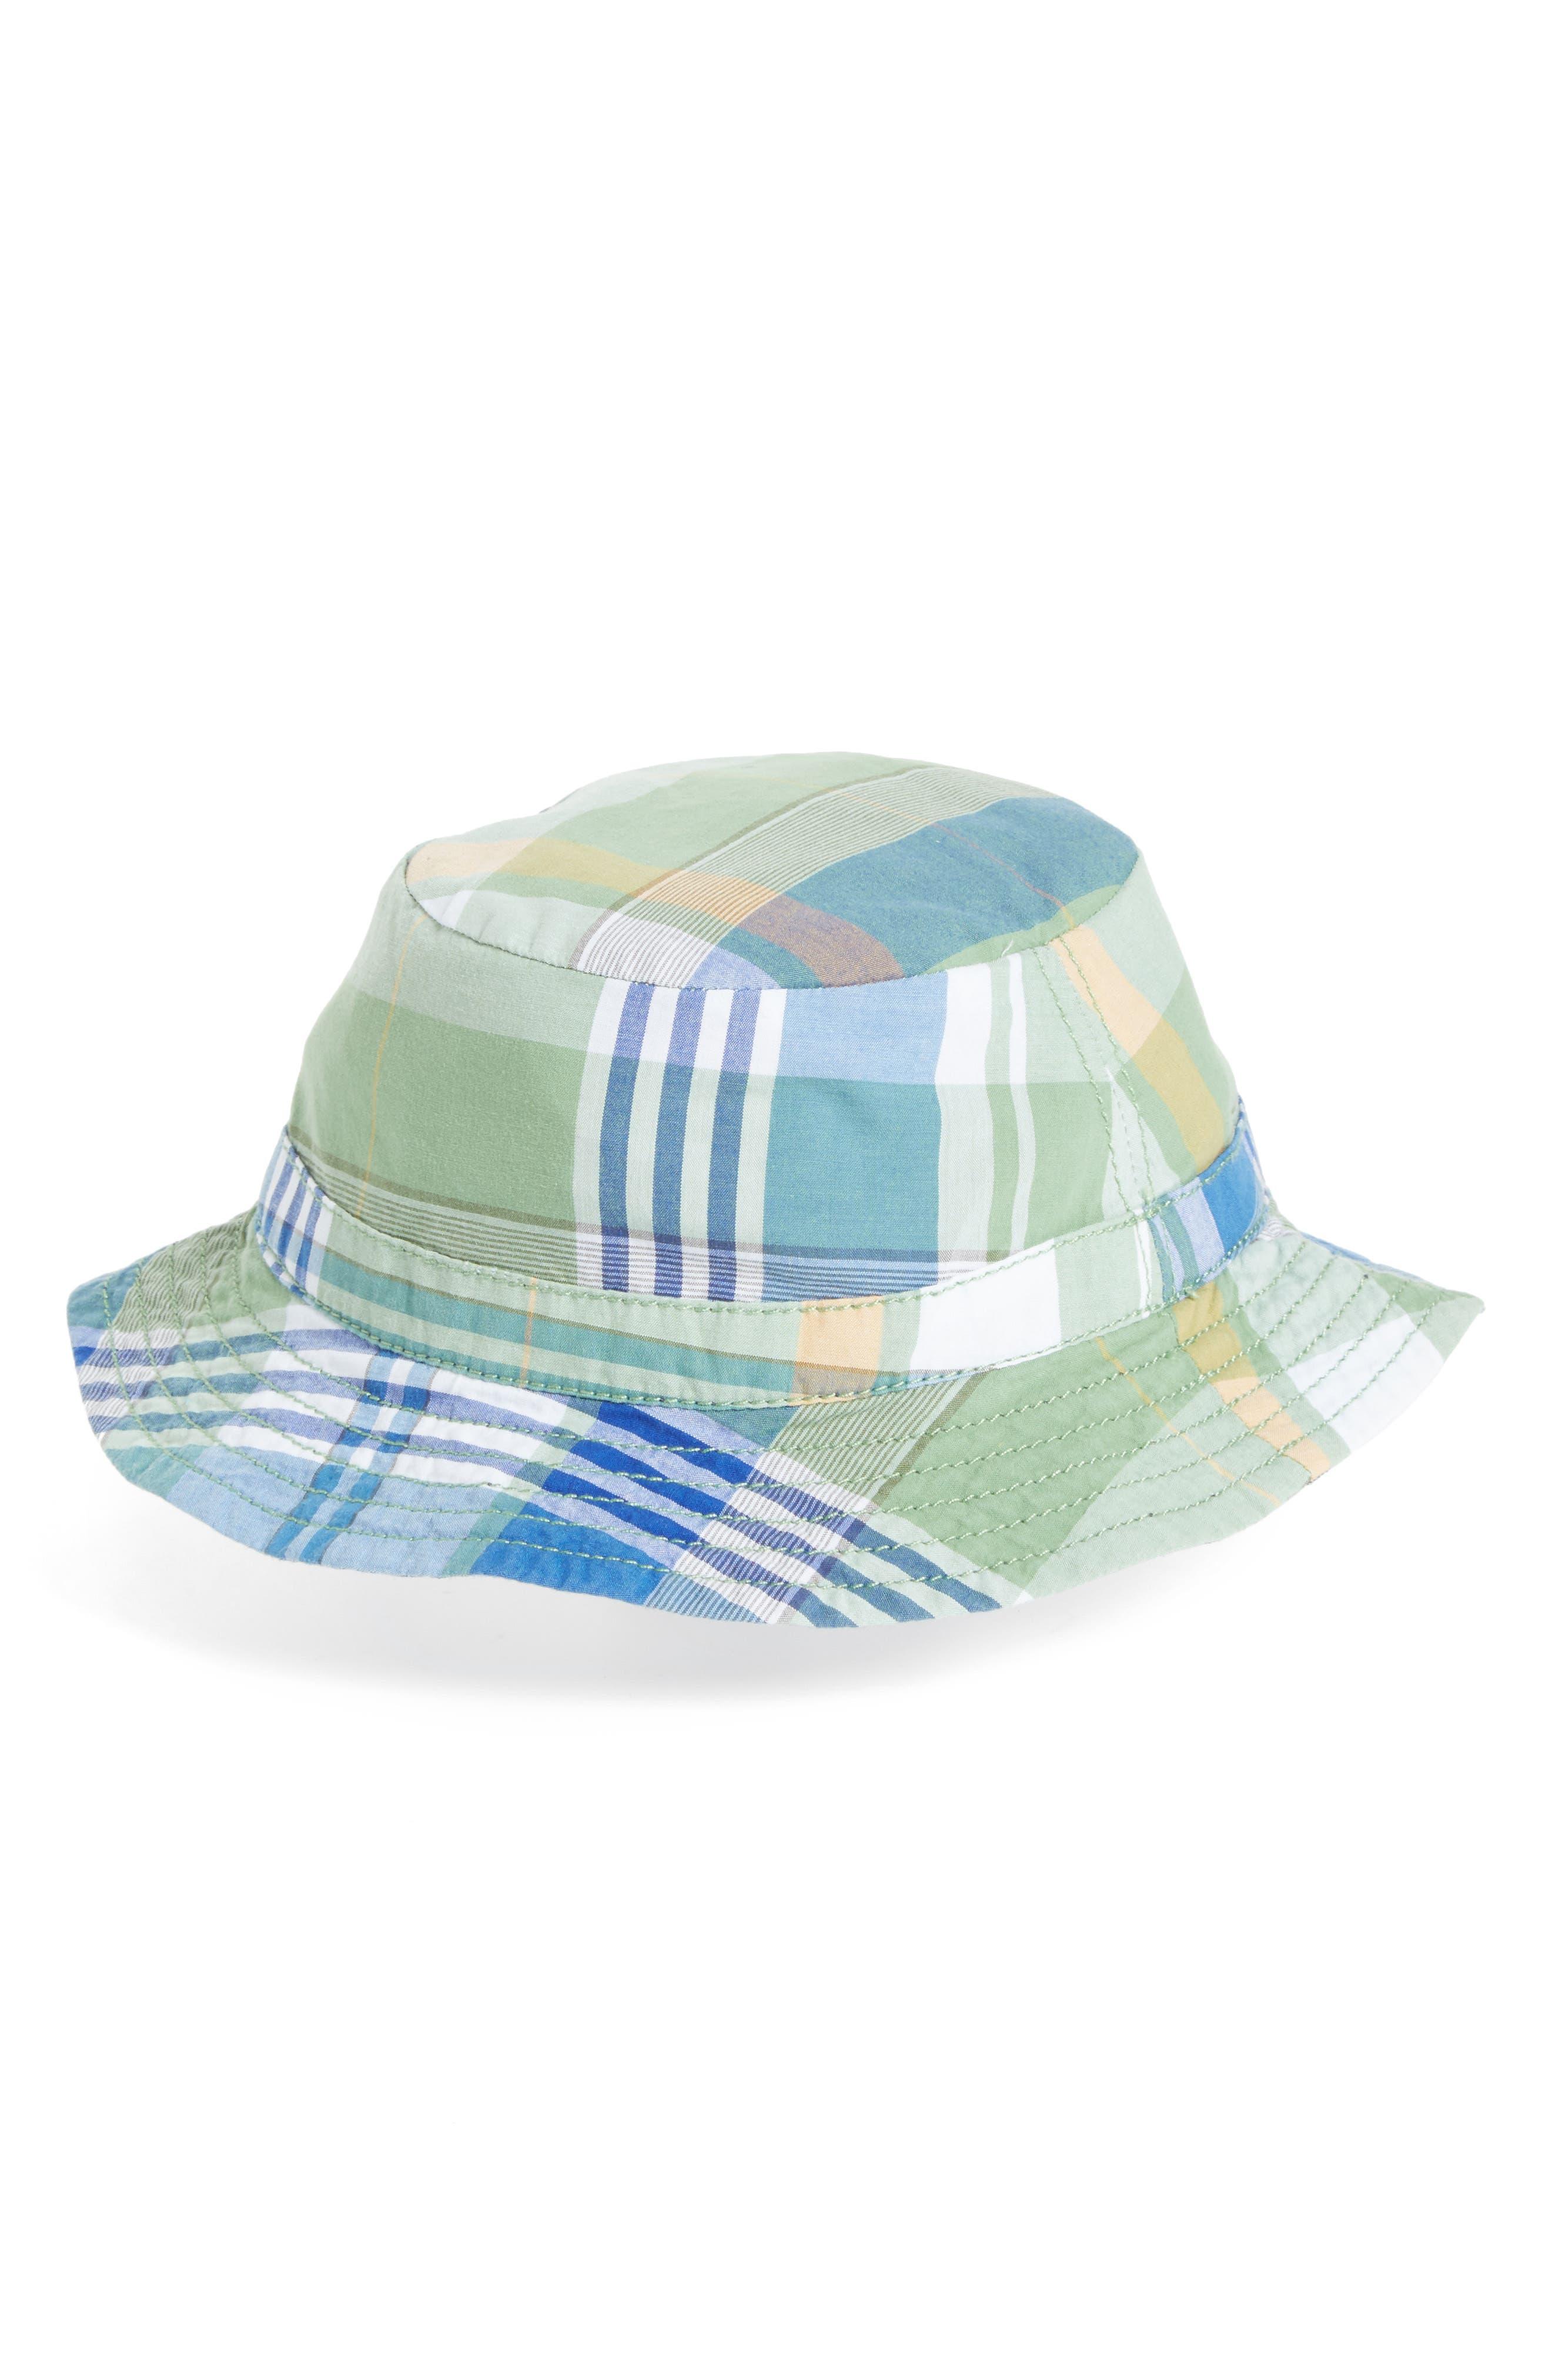 Alternate Image 1 Selected - Tucker + Tate Reversible Bucket Hat (Baby Boys)